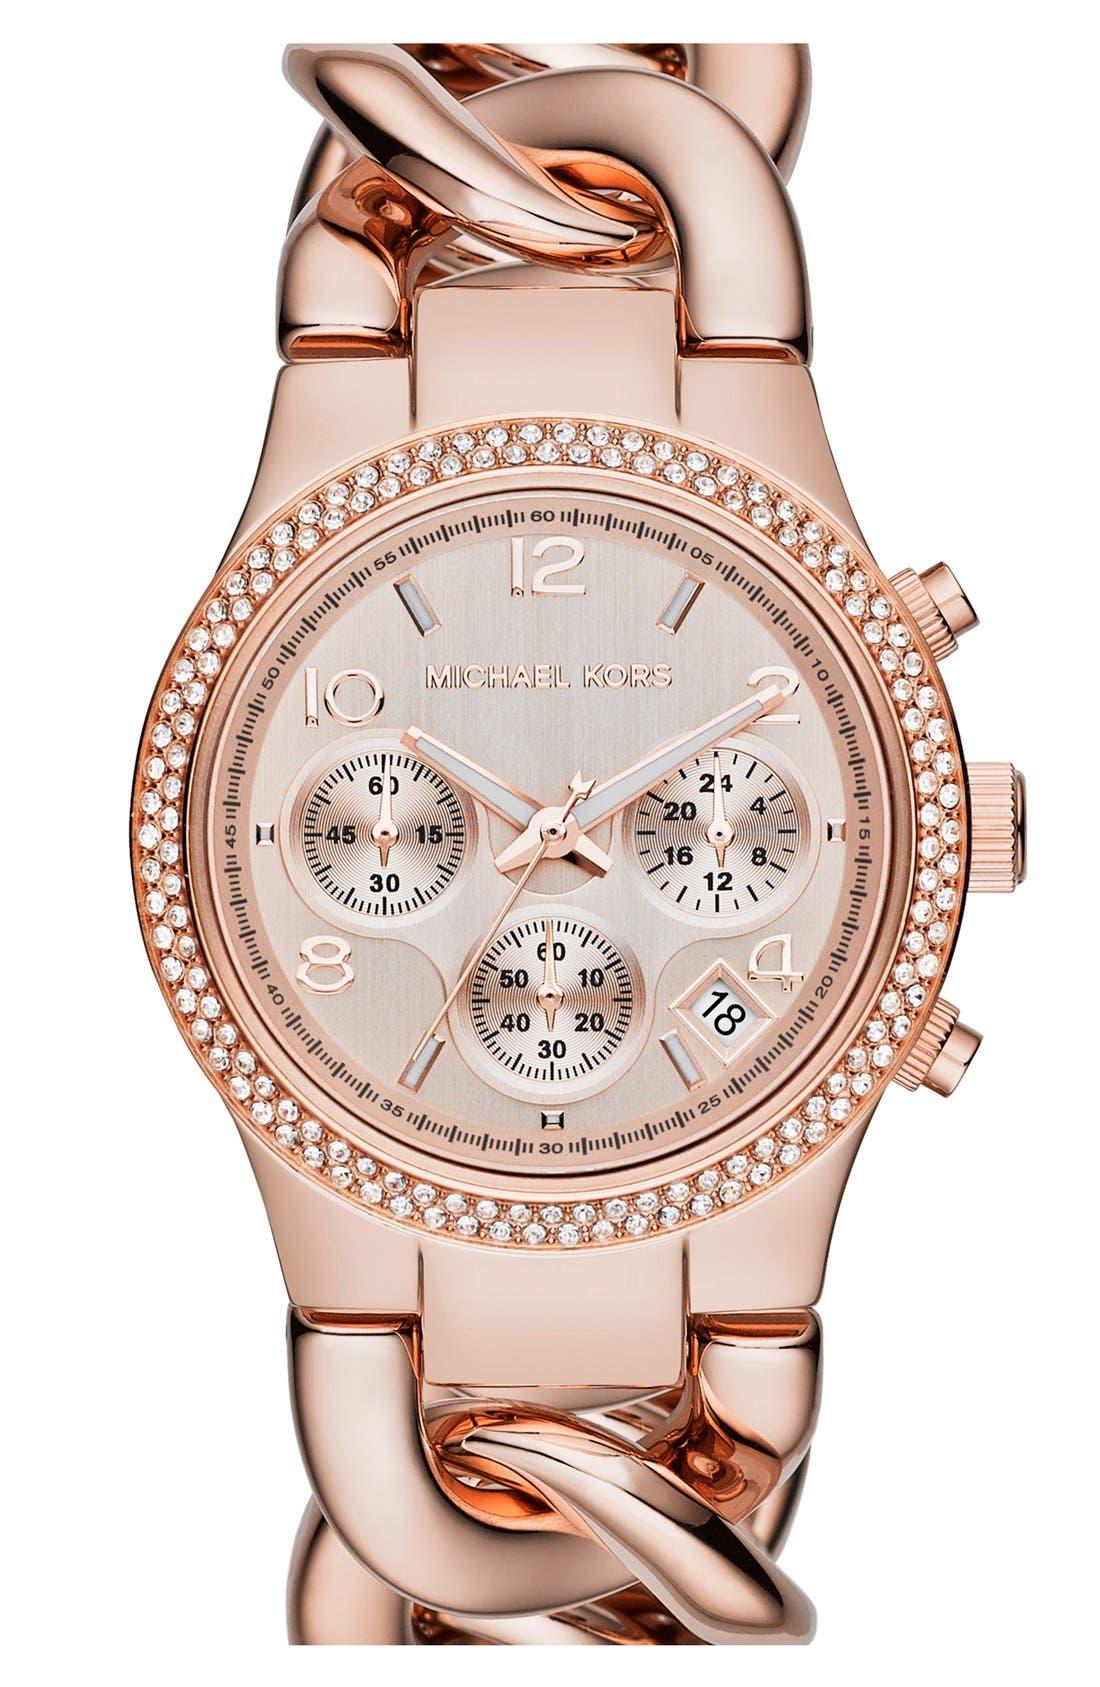 Main Image - Michael Kors 'Runway' Chain Bracelet Watch, 38mm